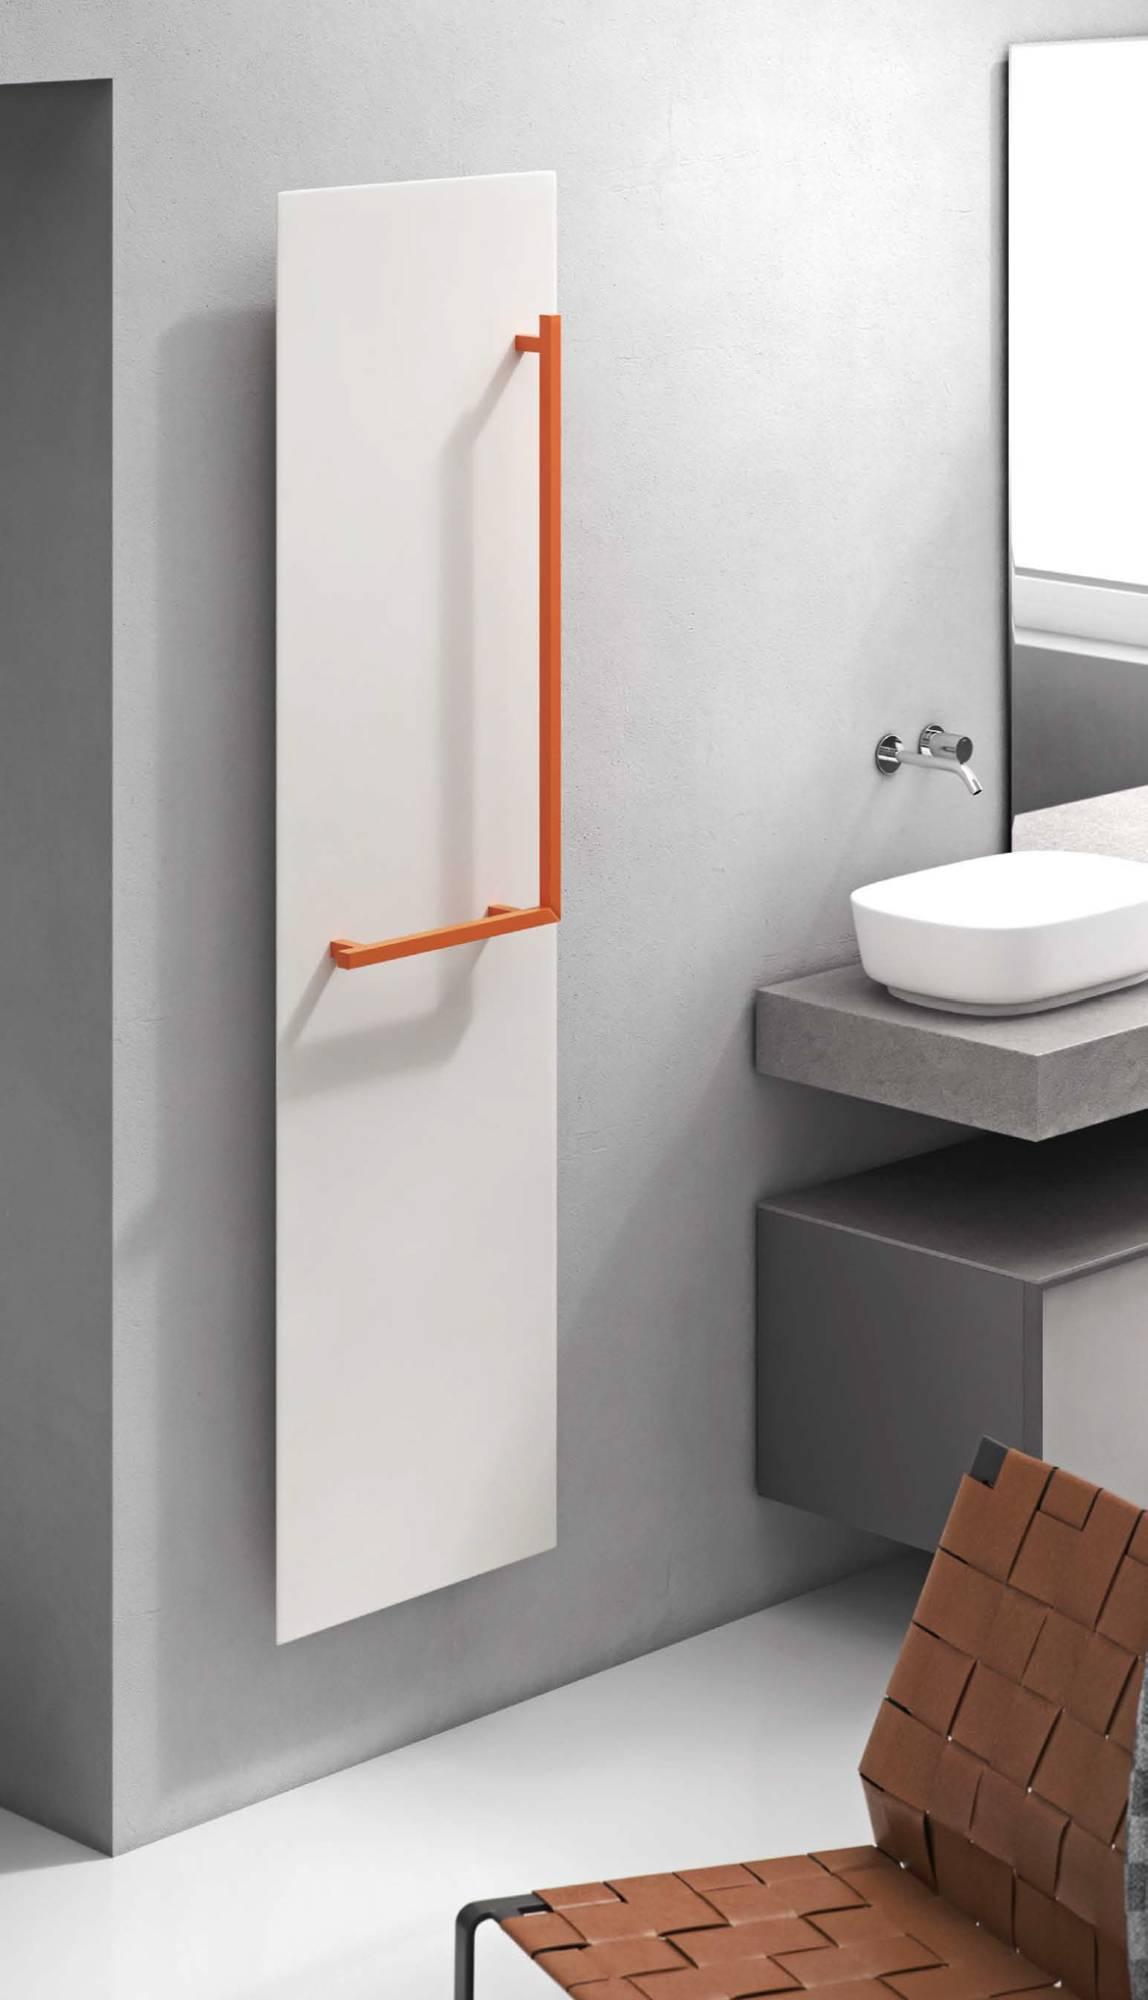 Chauffe-serviette-a-plaque-Graziano-radiateurs---blog